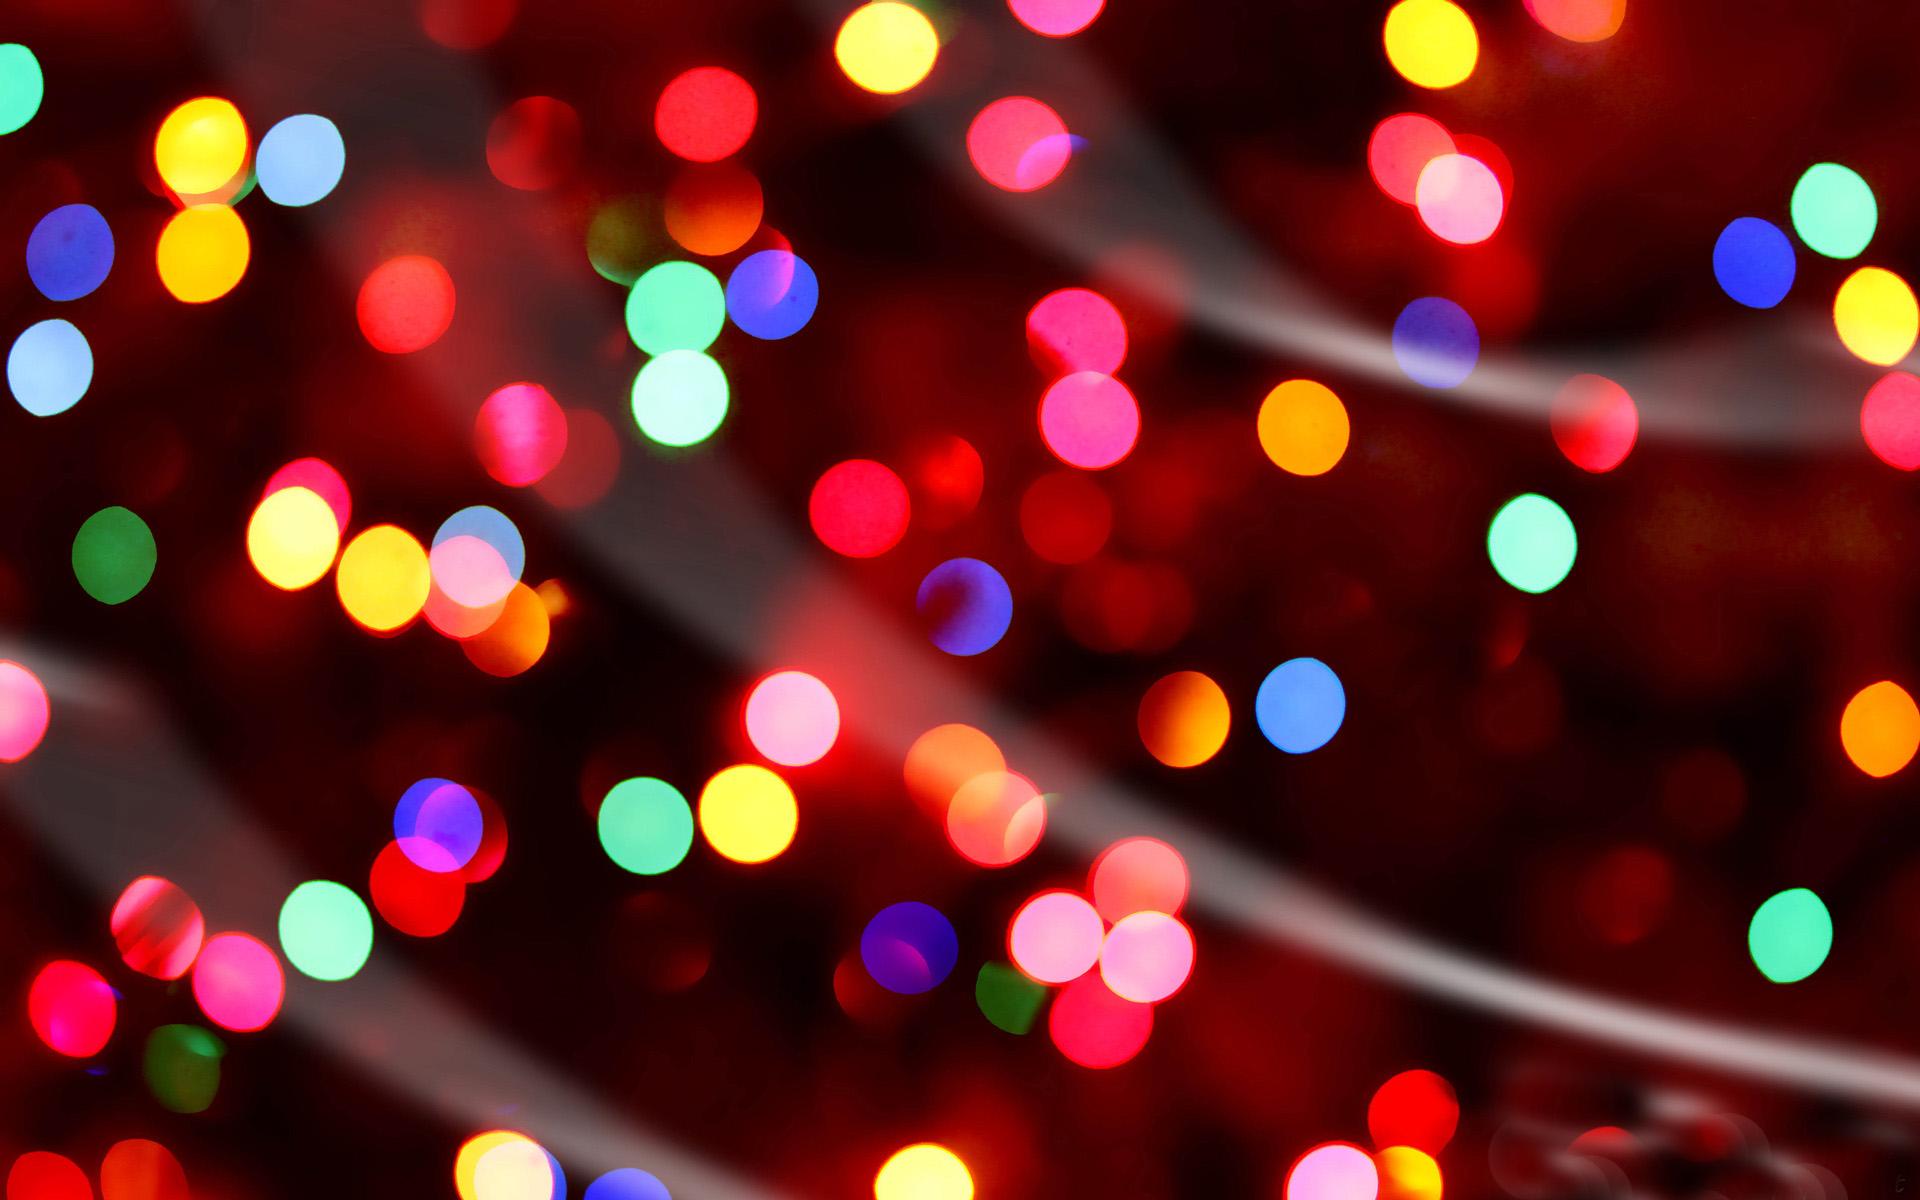 christmas-lights-tumblr-tremendous-wallpaper